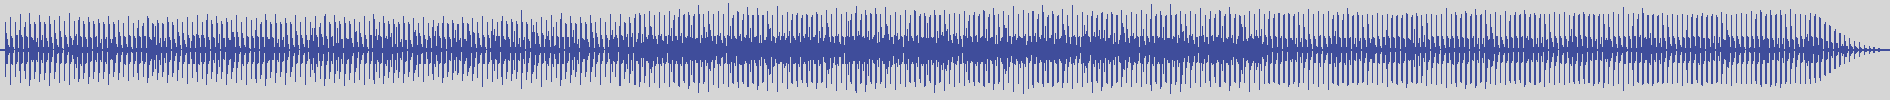 workin [WRK007] Kyle Fenton - Once Again [Lorentz Goga's House Mix] audio wave form